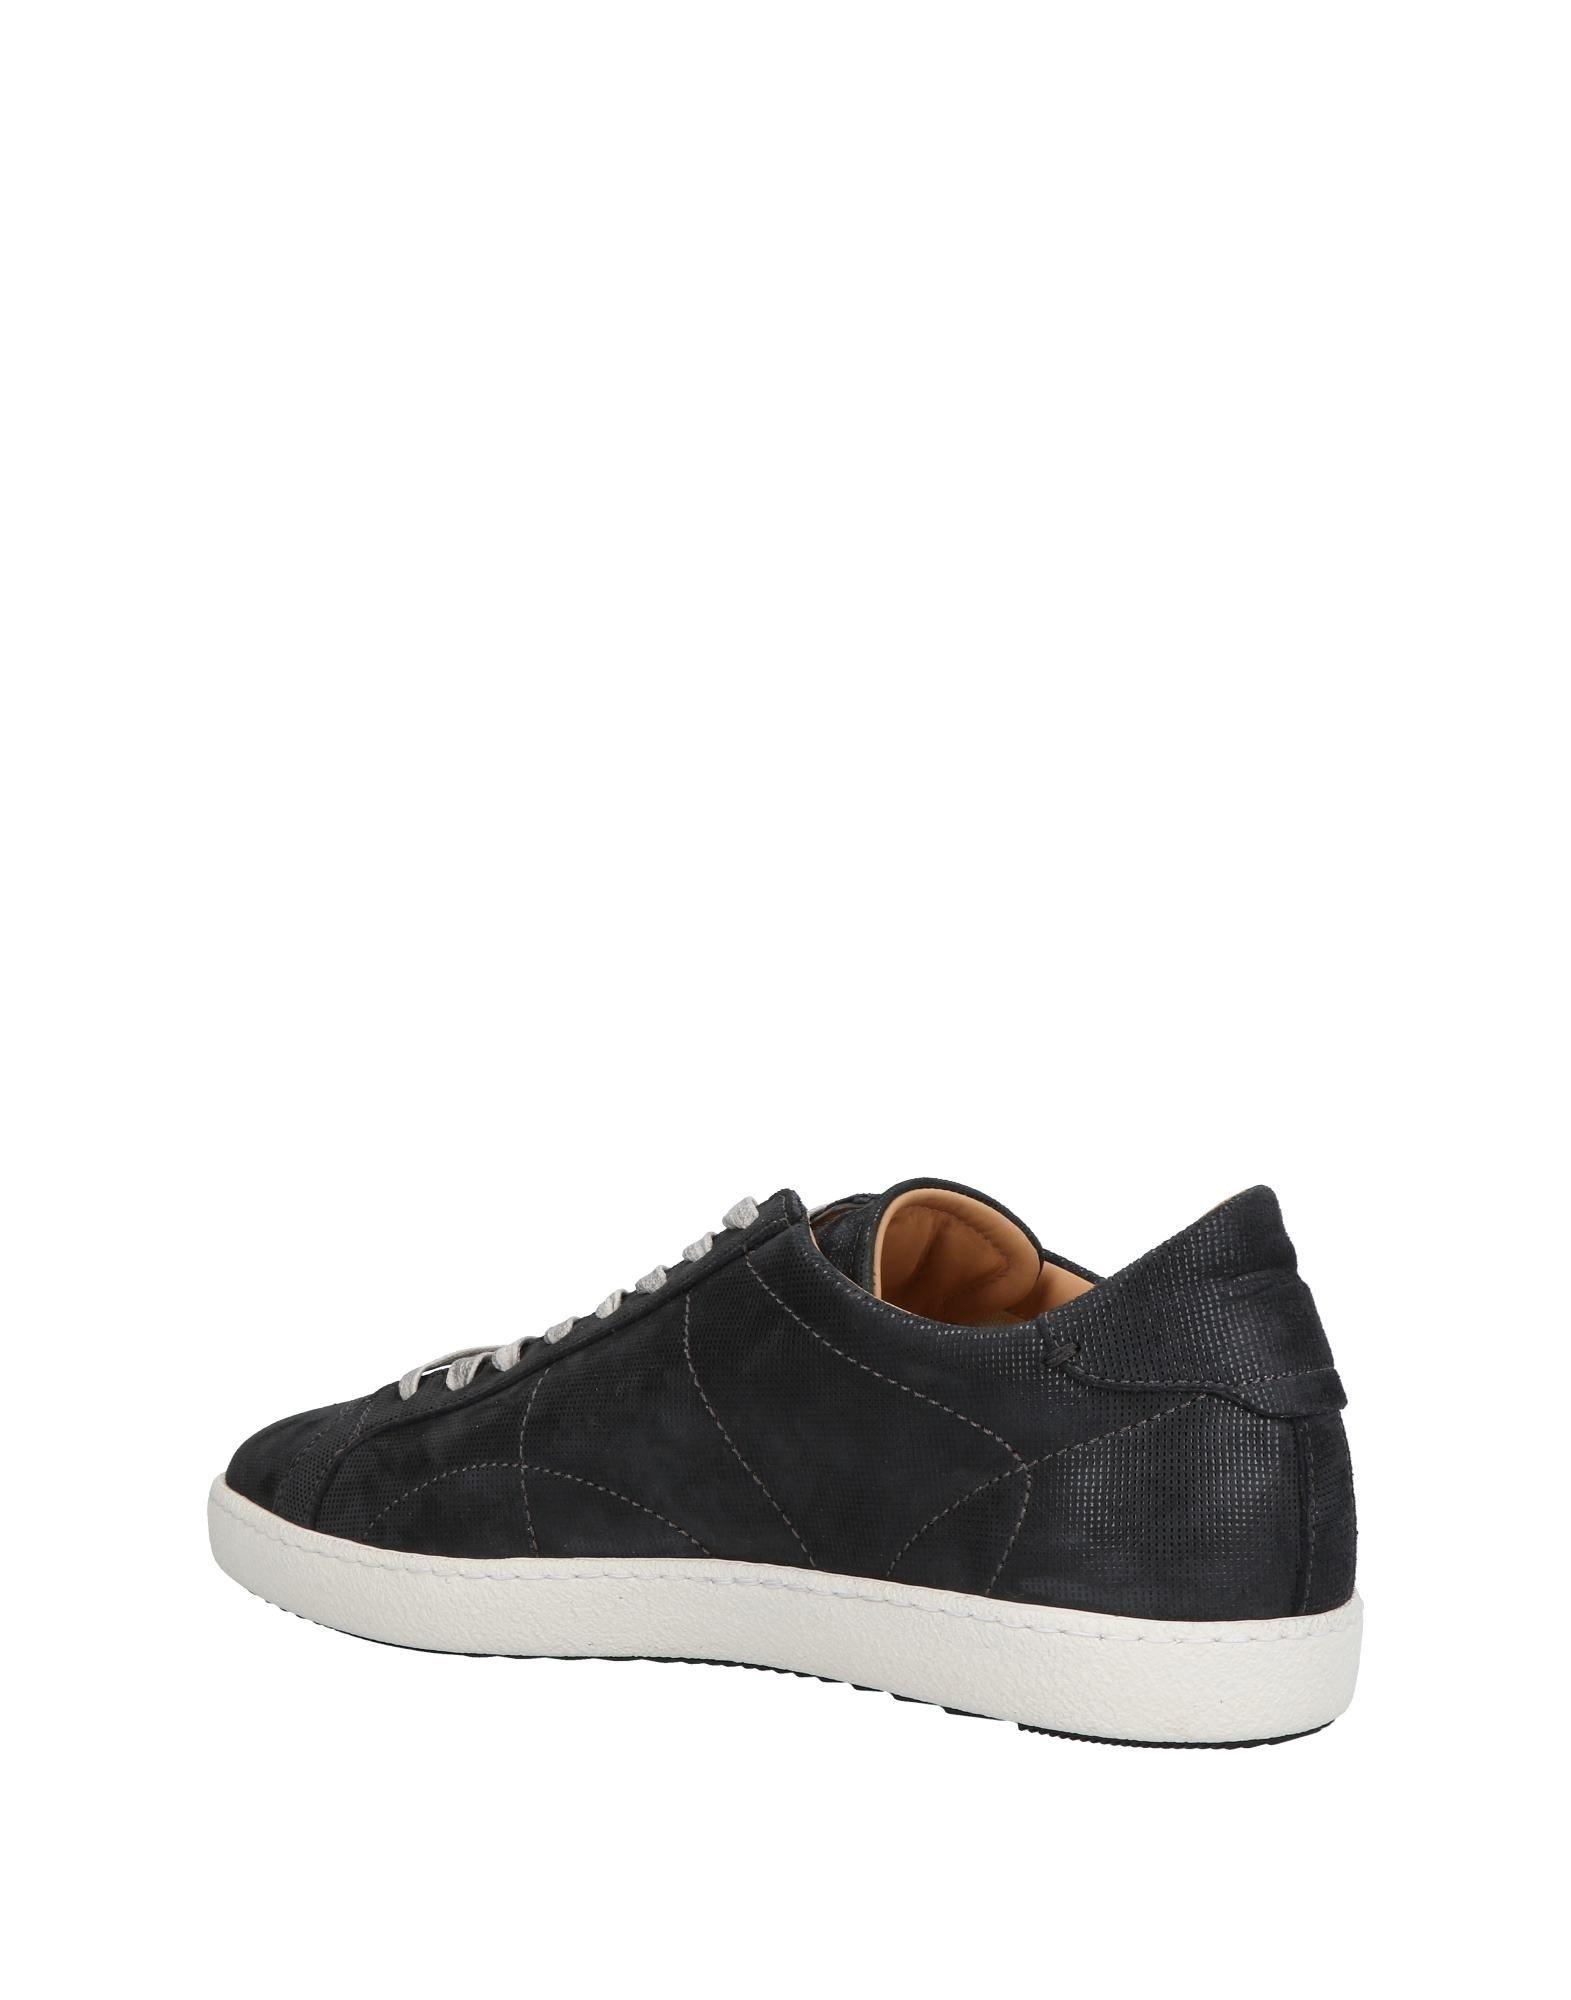 Santoni Sneakers Gute Herren  11478562AV Gute Sneakers Qualität beliebte Schuhe 0f544b